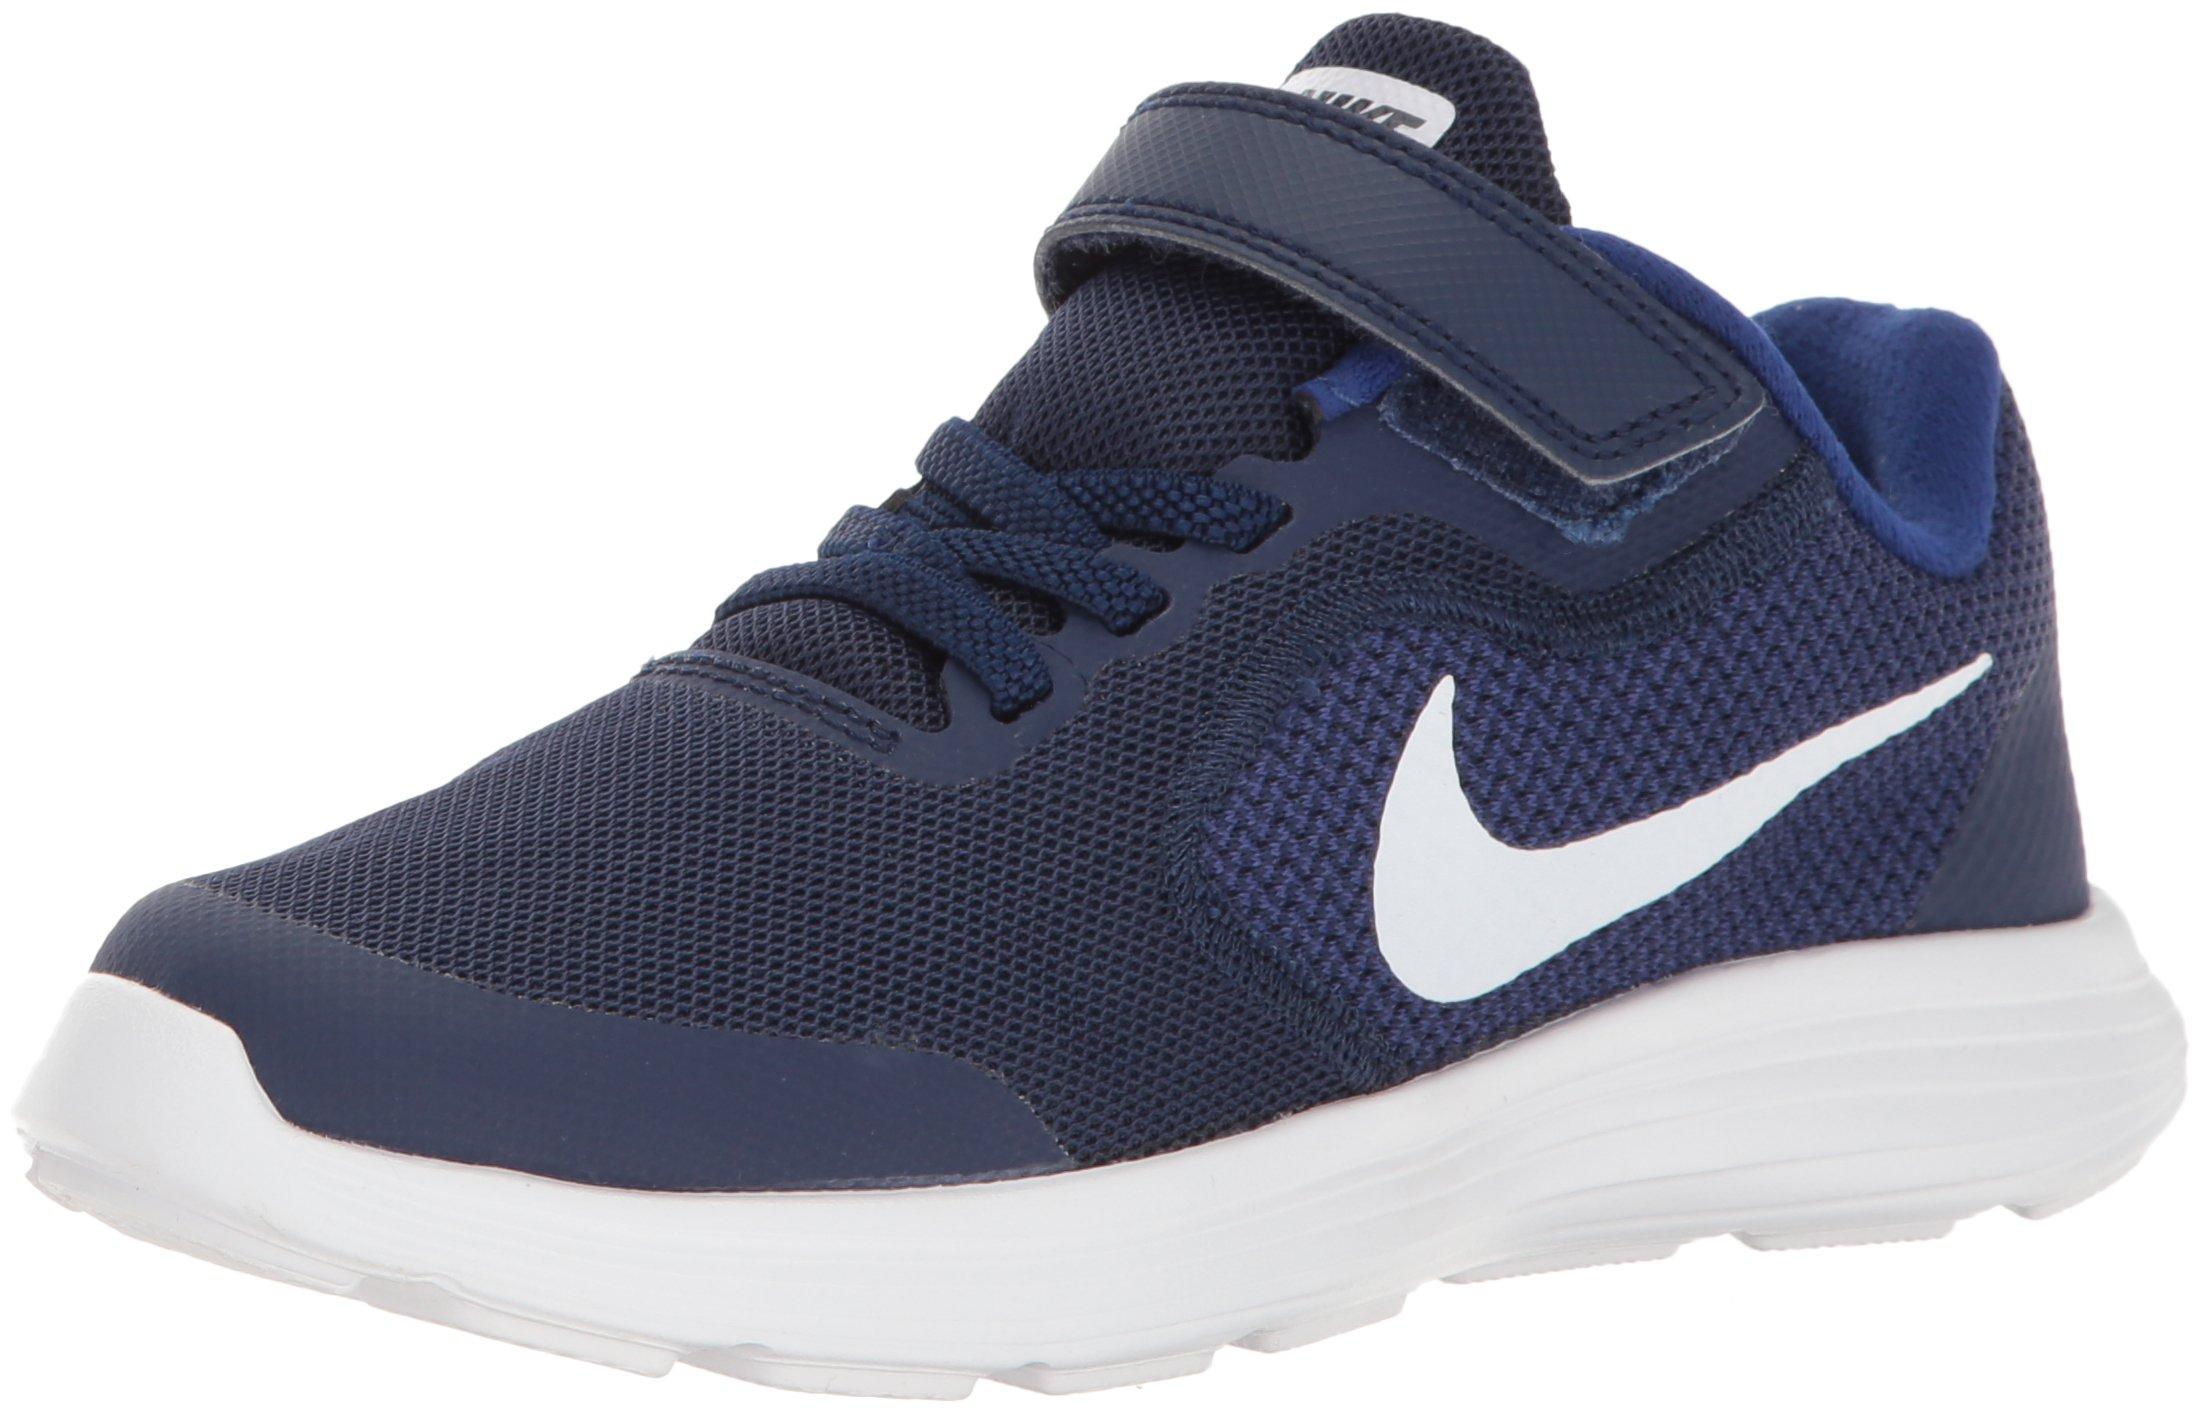 Nike - Revolution 3 Psv - 819414406 - Color: Azul marino-Blanco-Negro - Size: 28.5